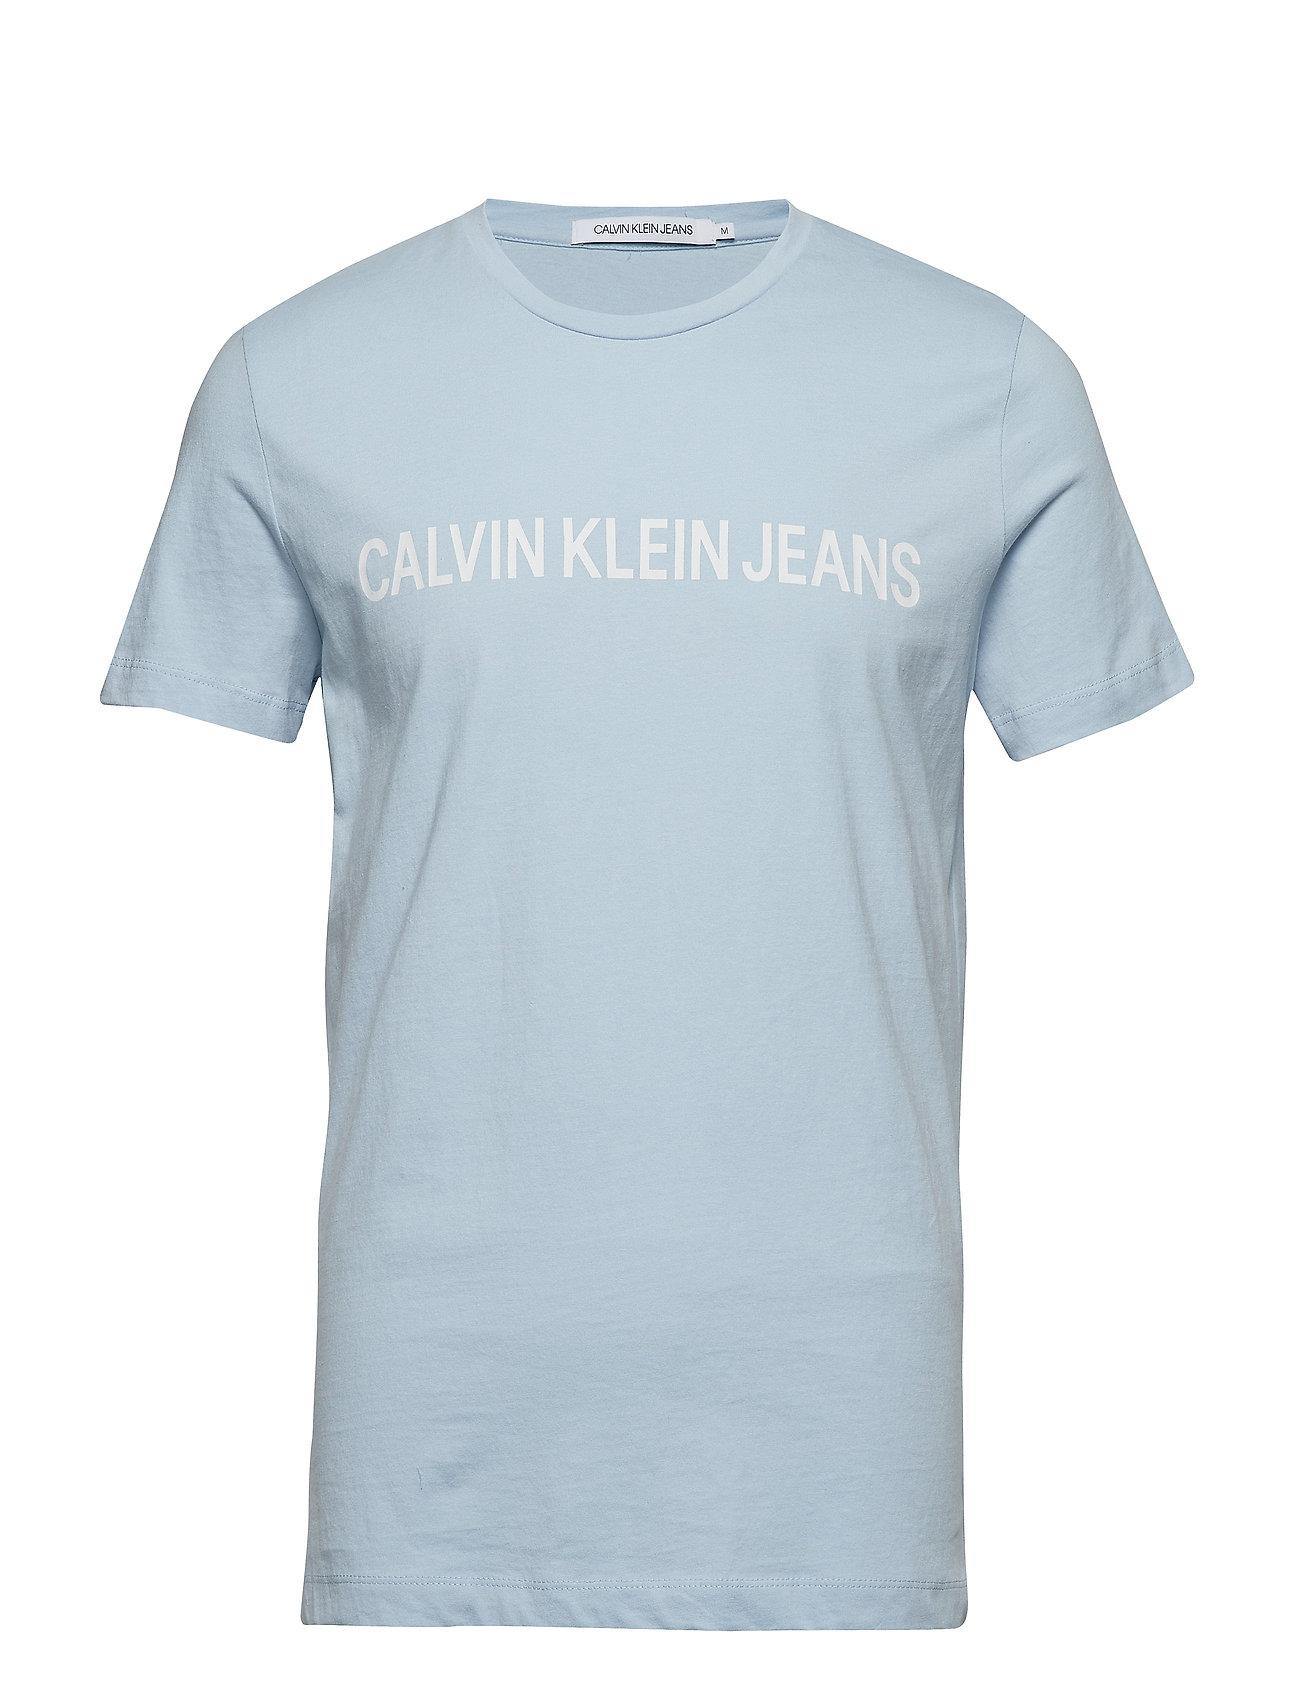 Calvin Klein Jeans INSTITUTIONAL SLIM LOGO TEE - SKYWAY/WHITE